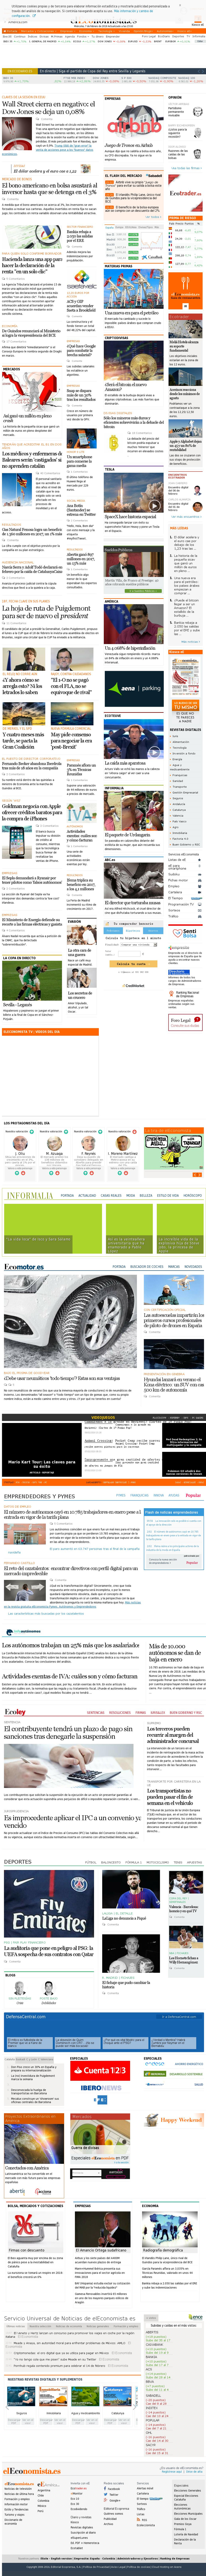 elEconomista at Wednesday Feb. 7, 2018, 10:05 p.m. UTC